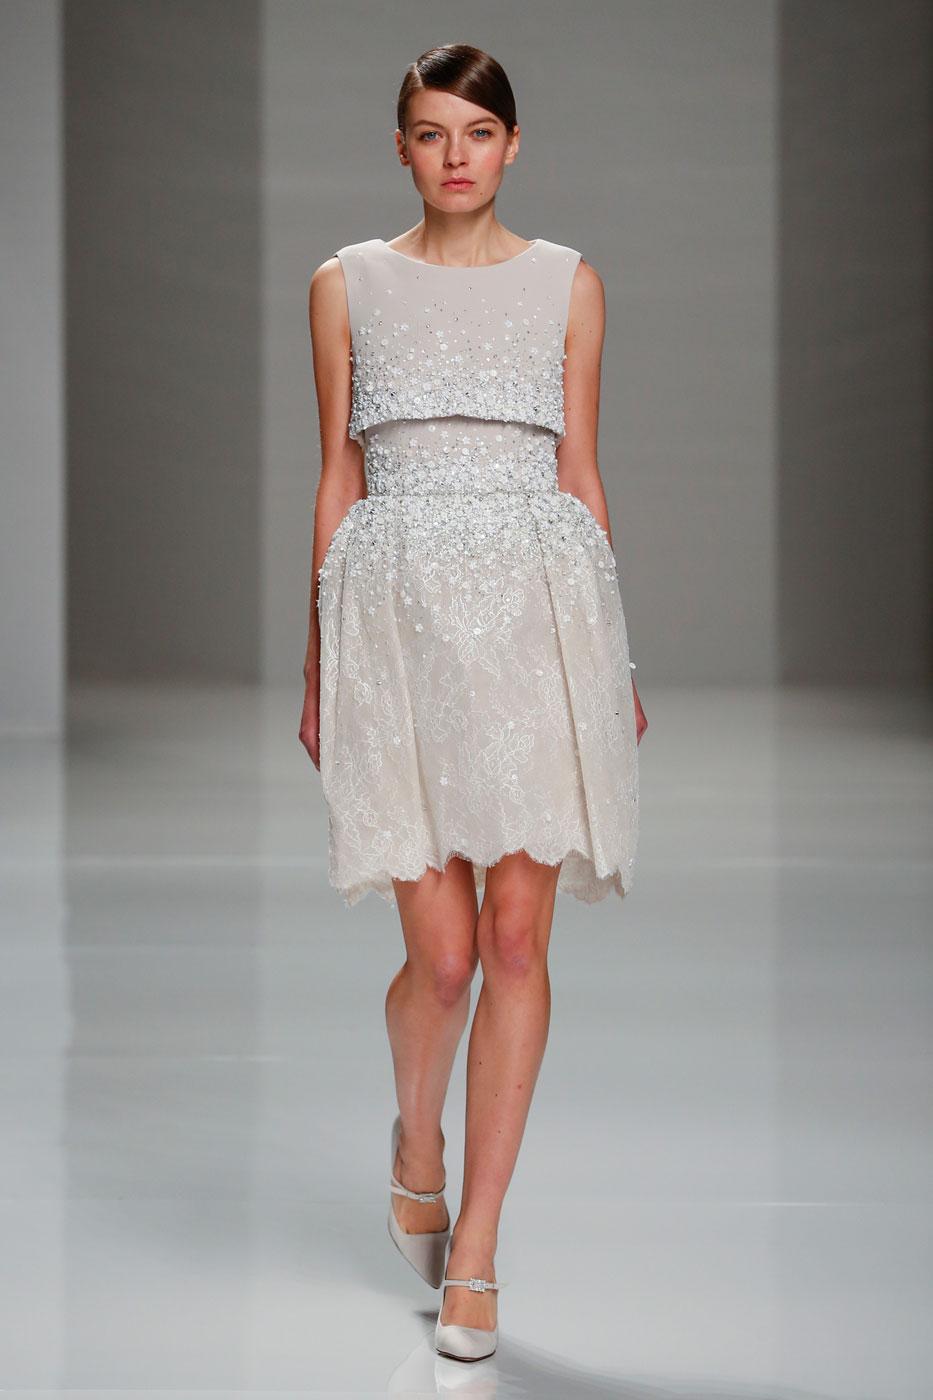 Georges-Hobeika-fashion-runway-show-haute-couture-paris-spring-2015-the-impression-67